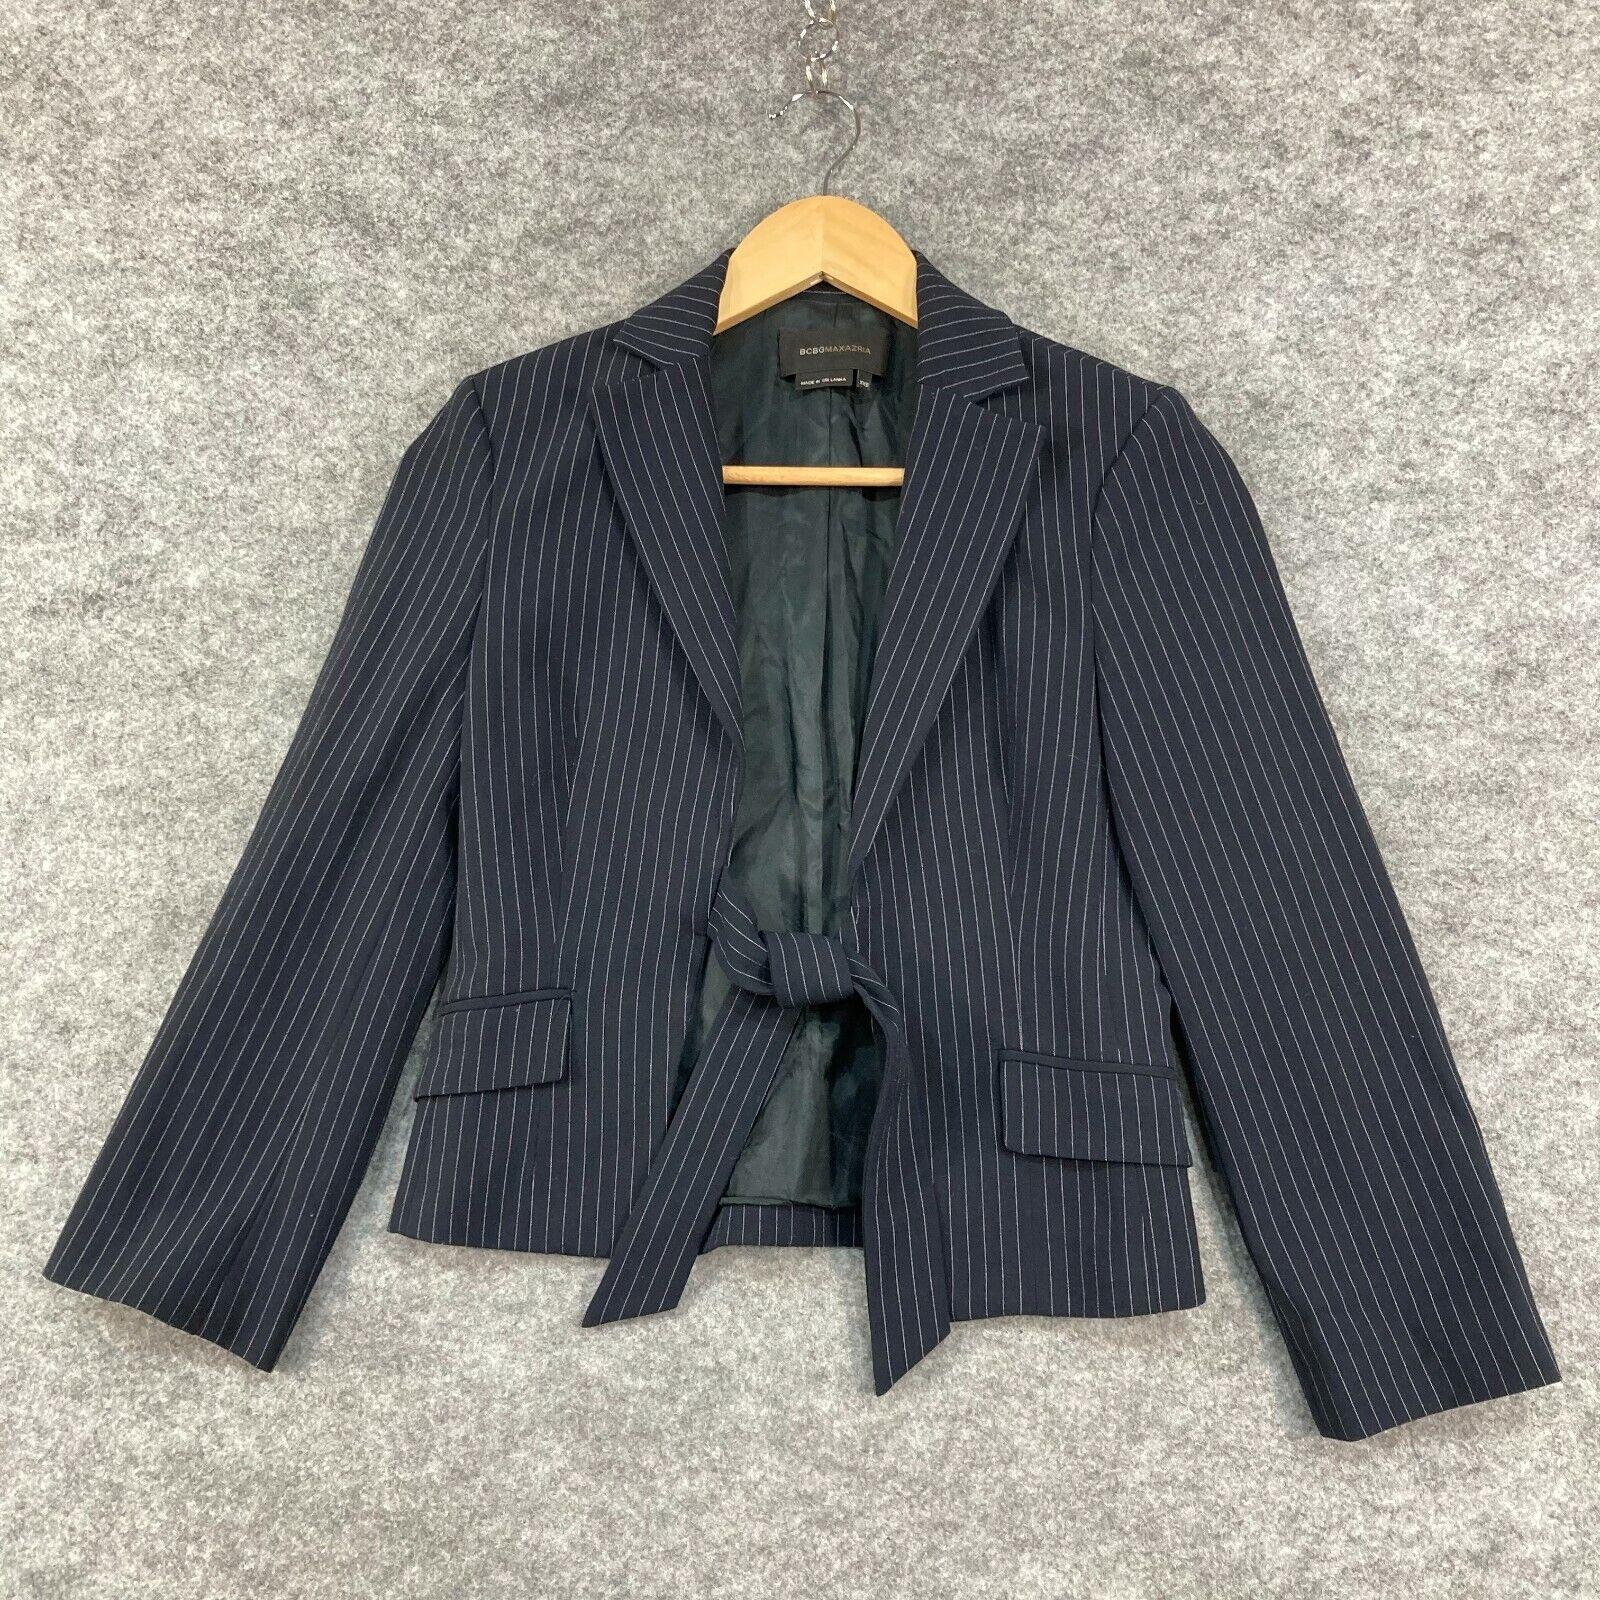 BCBGMAXAZRIA Womens Jacket Size 2XS Blue Striped Tie Front Long Sleeve 193.34